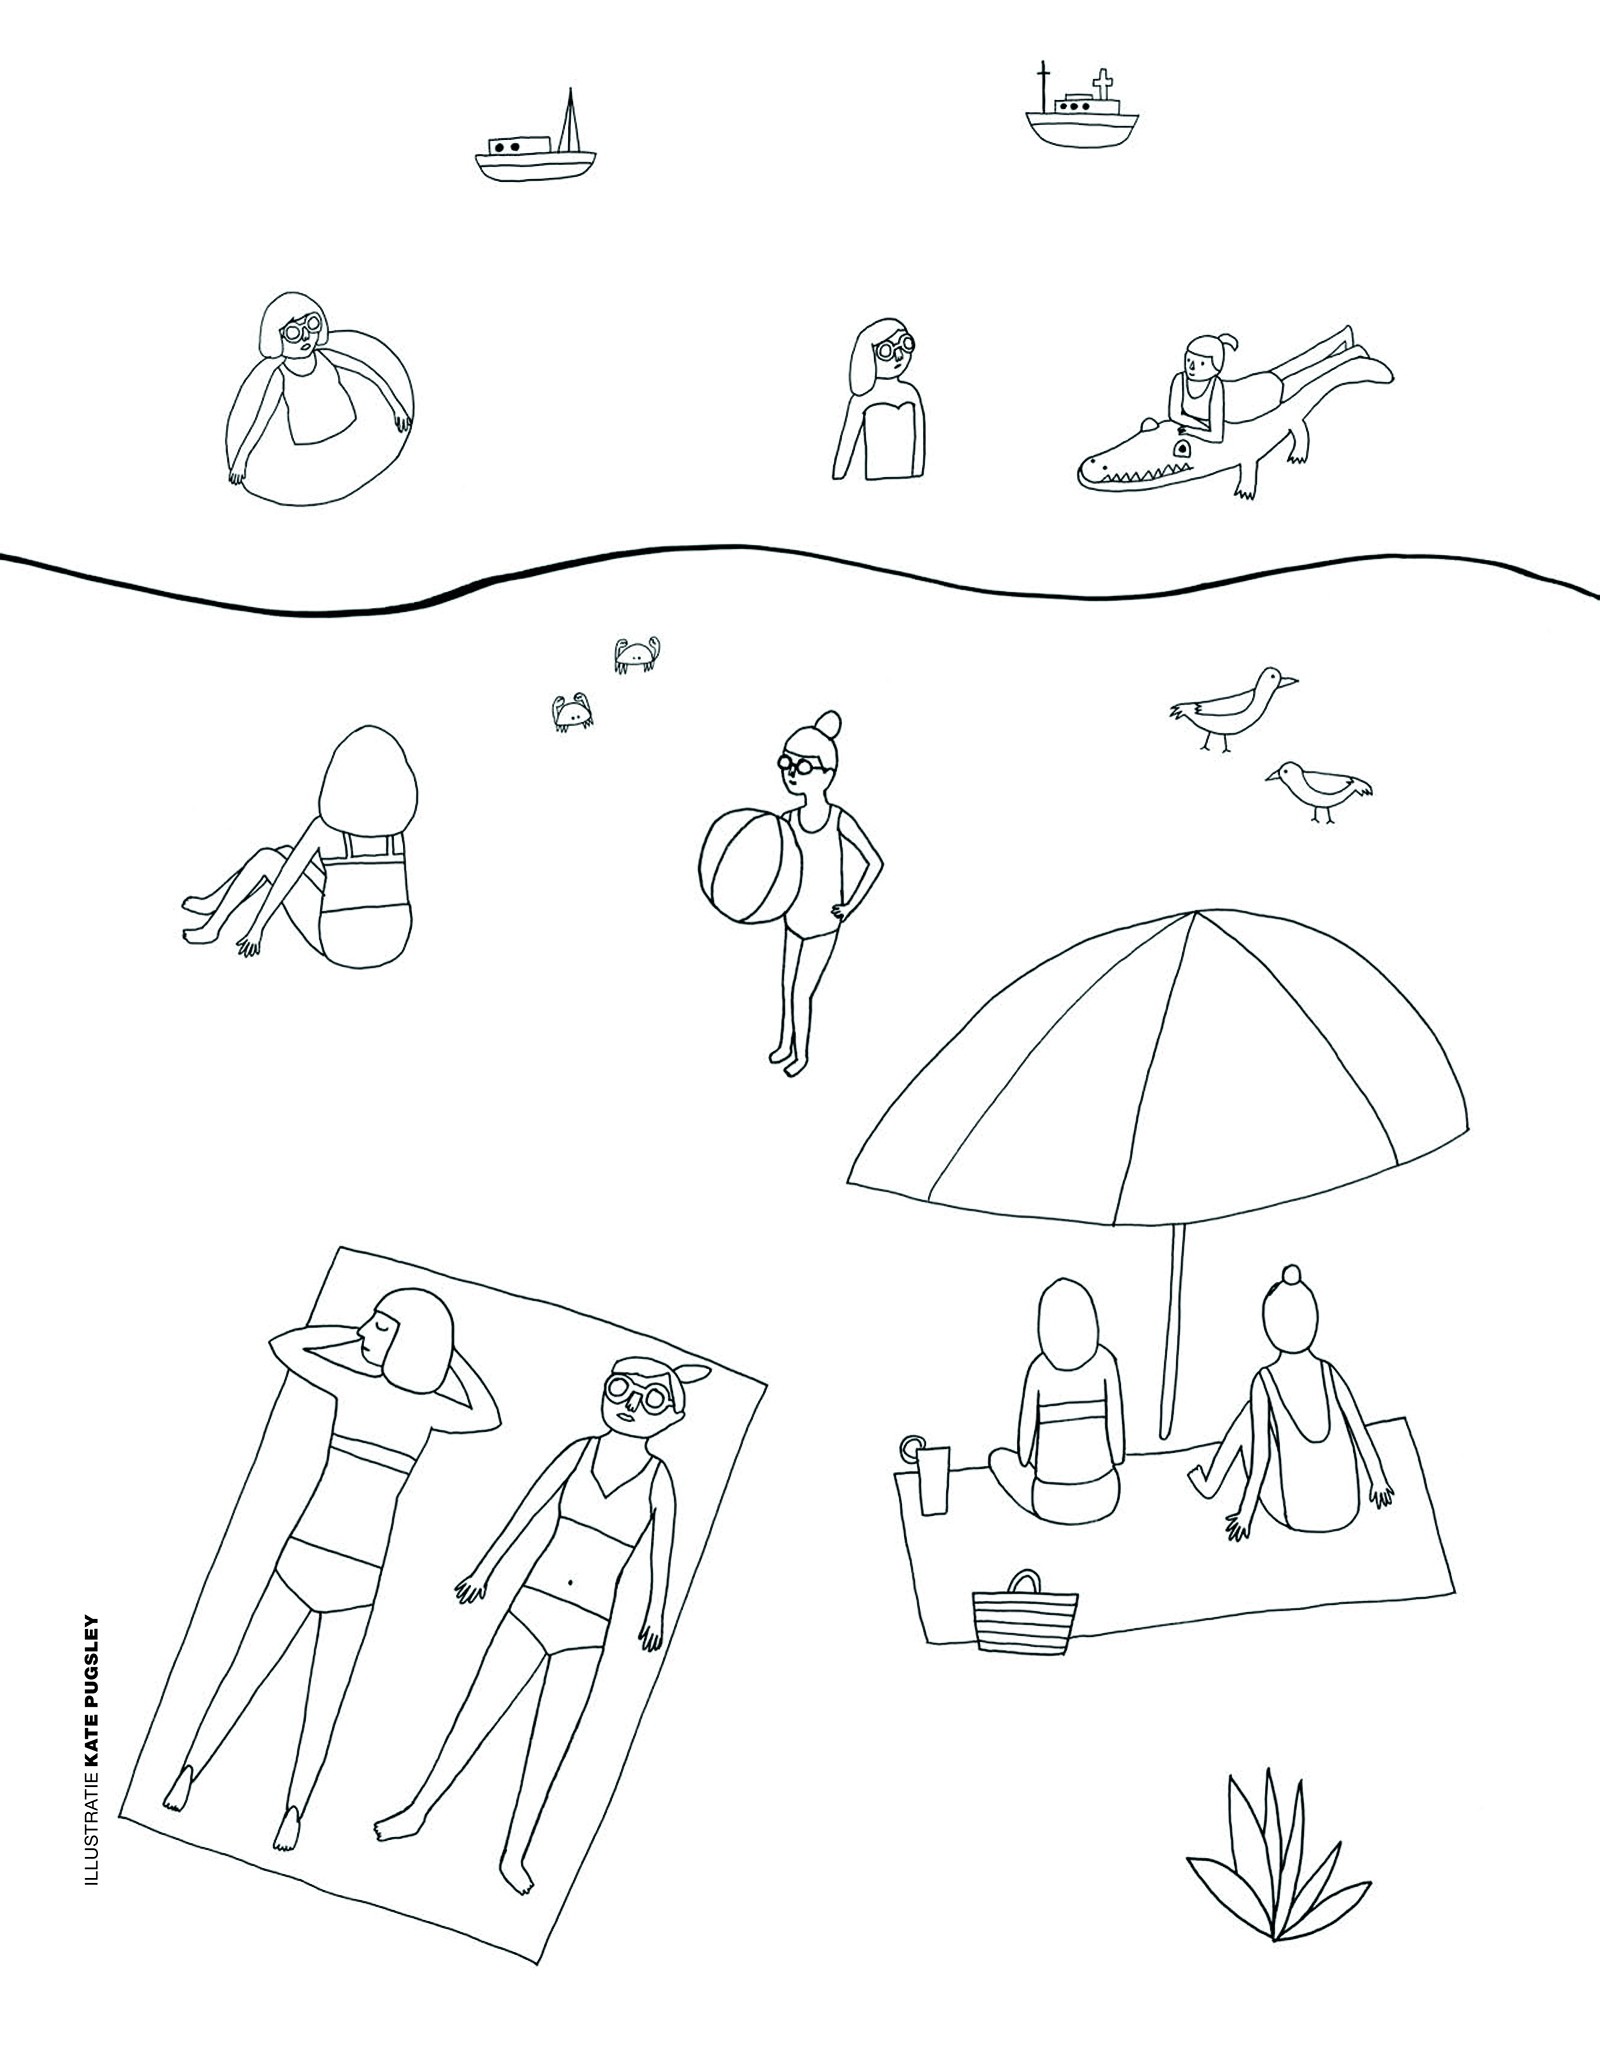 Print https://bin.snmmd.nl/m/w7x7jx321pq6.jpg/_flow-magazine-coloring-page-4-kate-pugsley.jpg